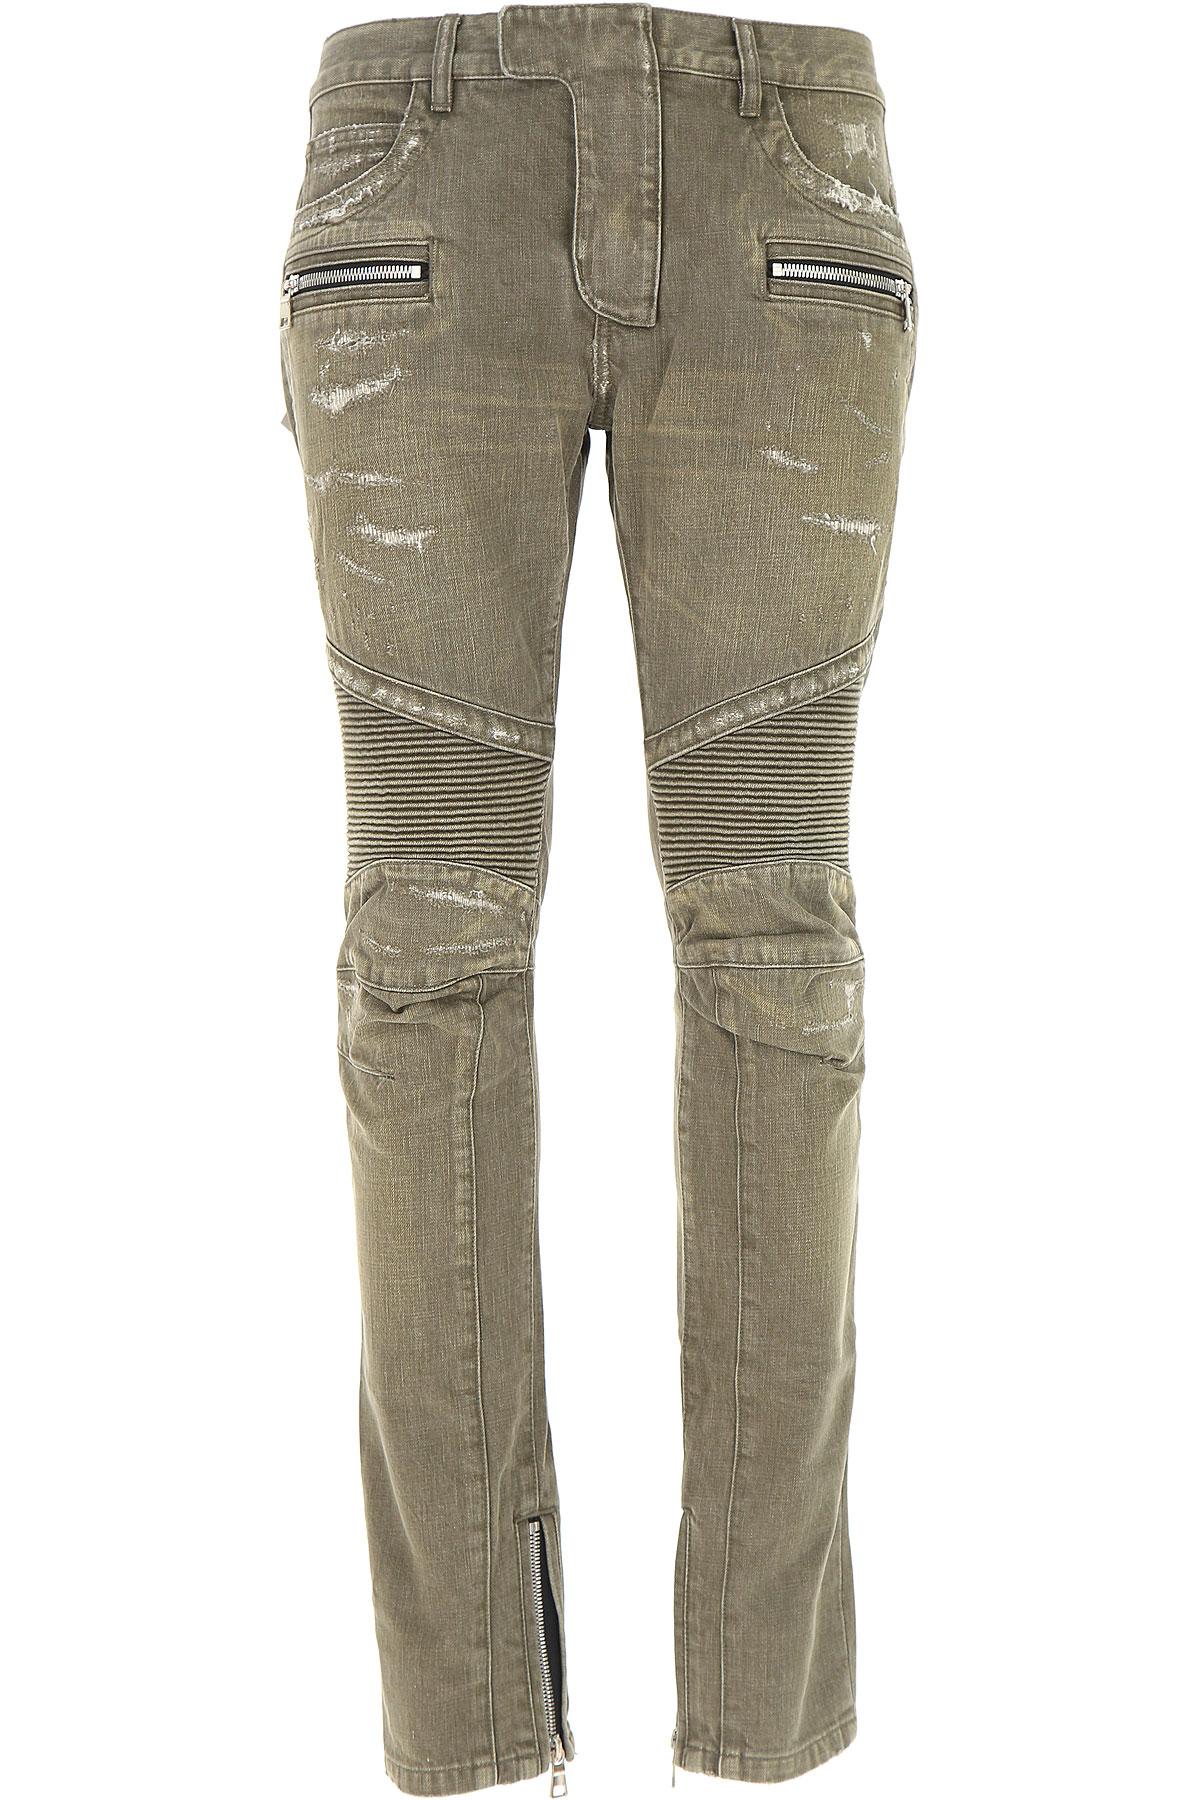 Balmain Jeans, Denim, Cotton, 2017, 30 34 36 USA-476617